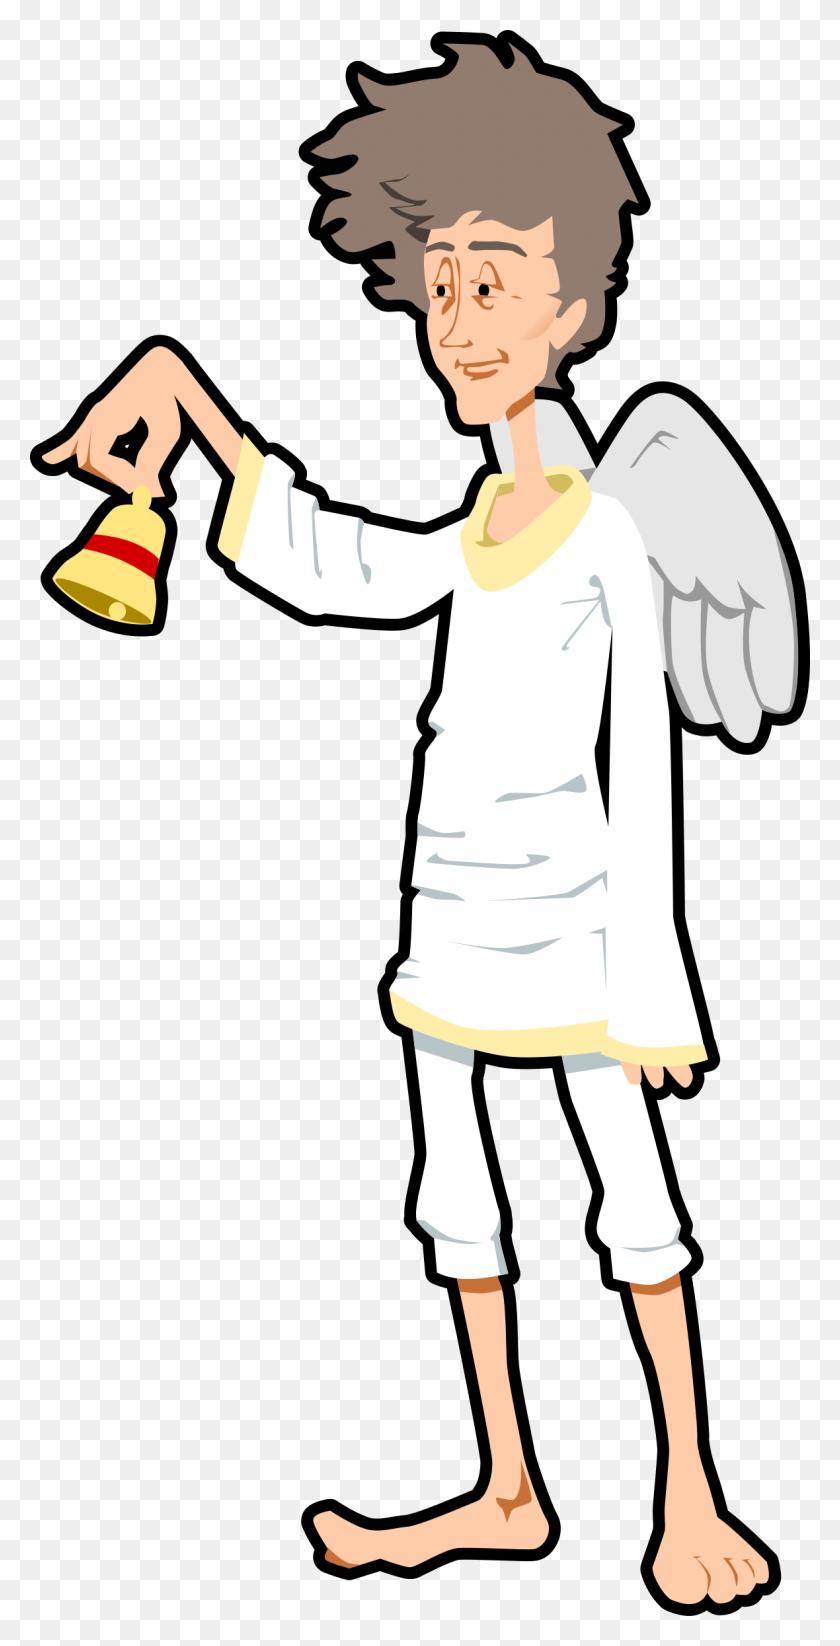 Clipart - Boy Angel Clipart